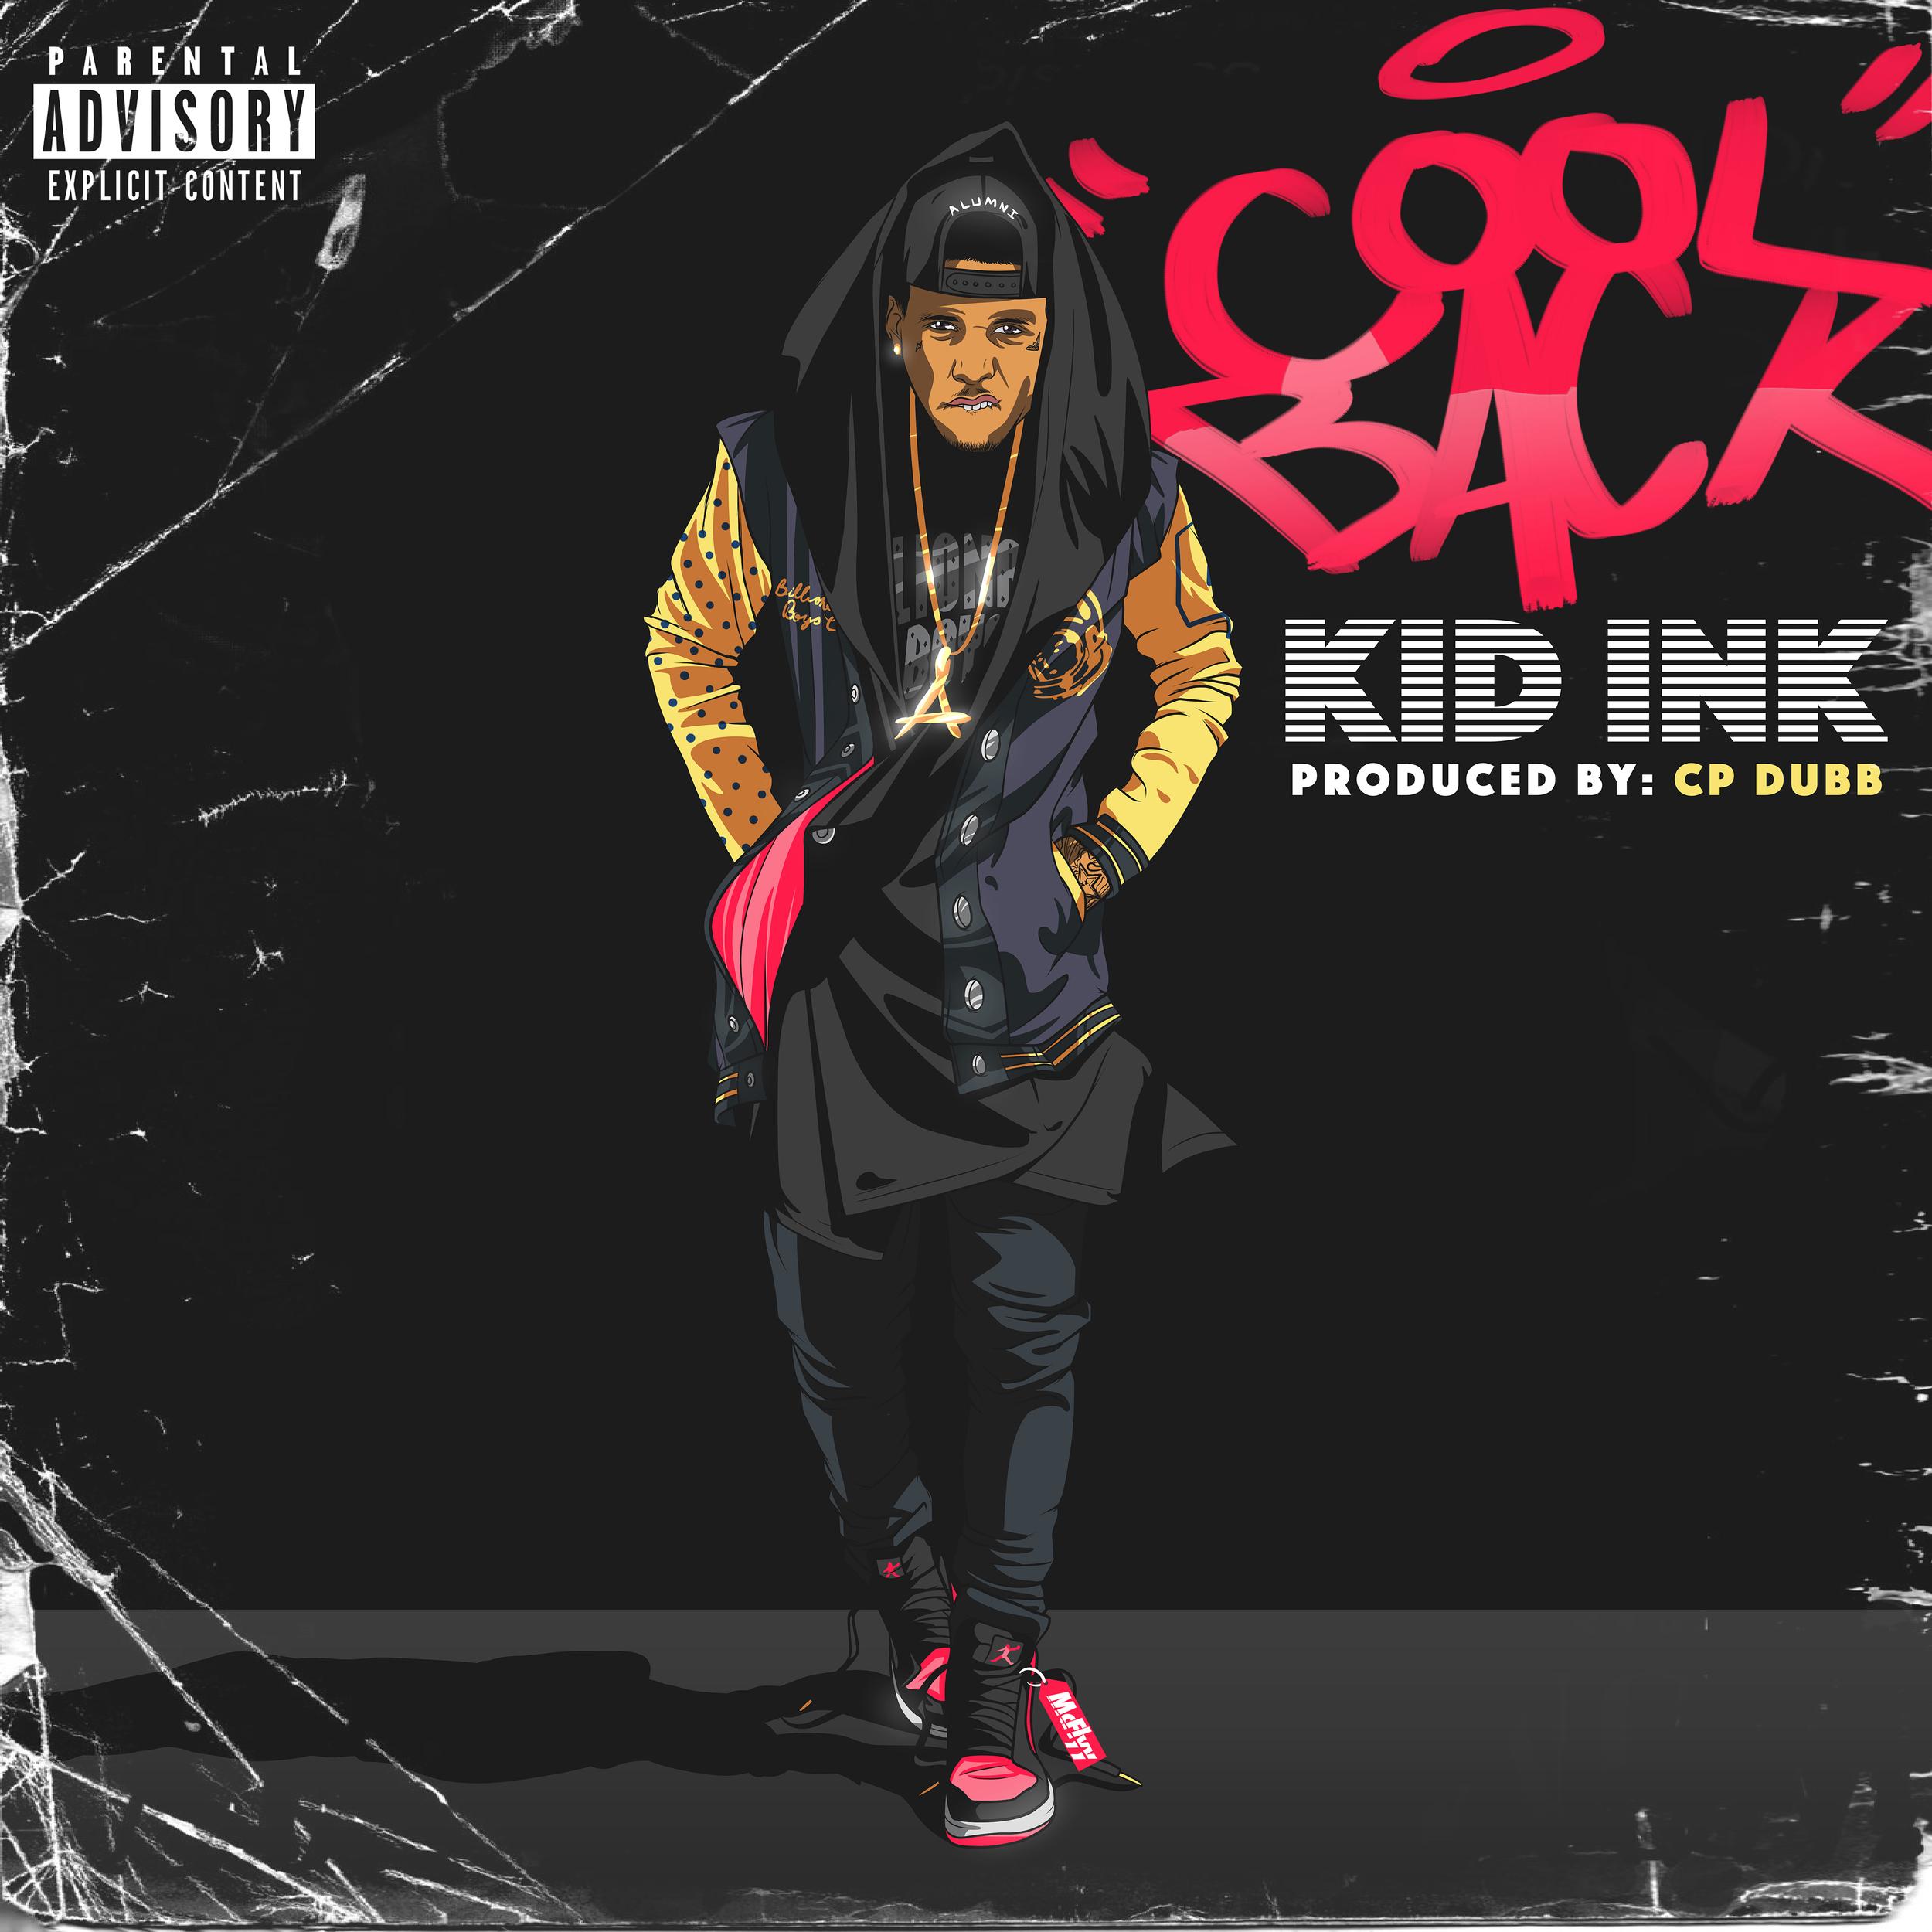 coolback4.jpg